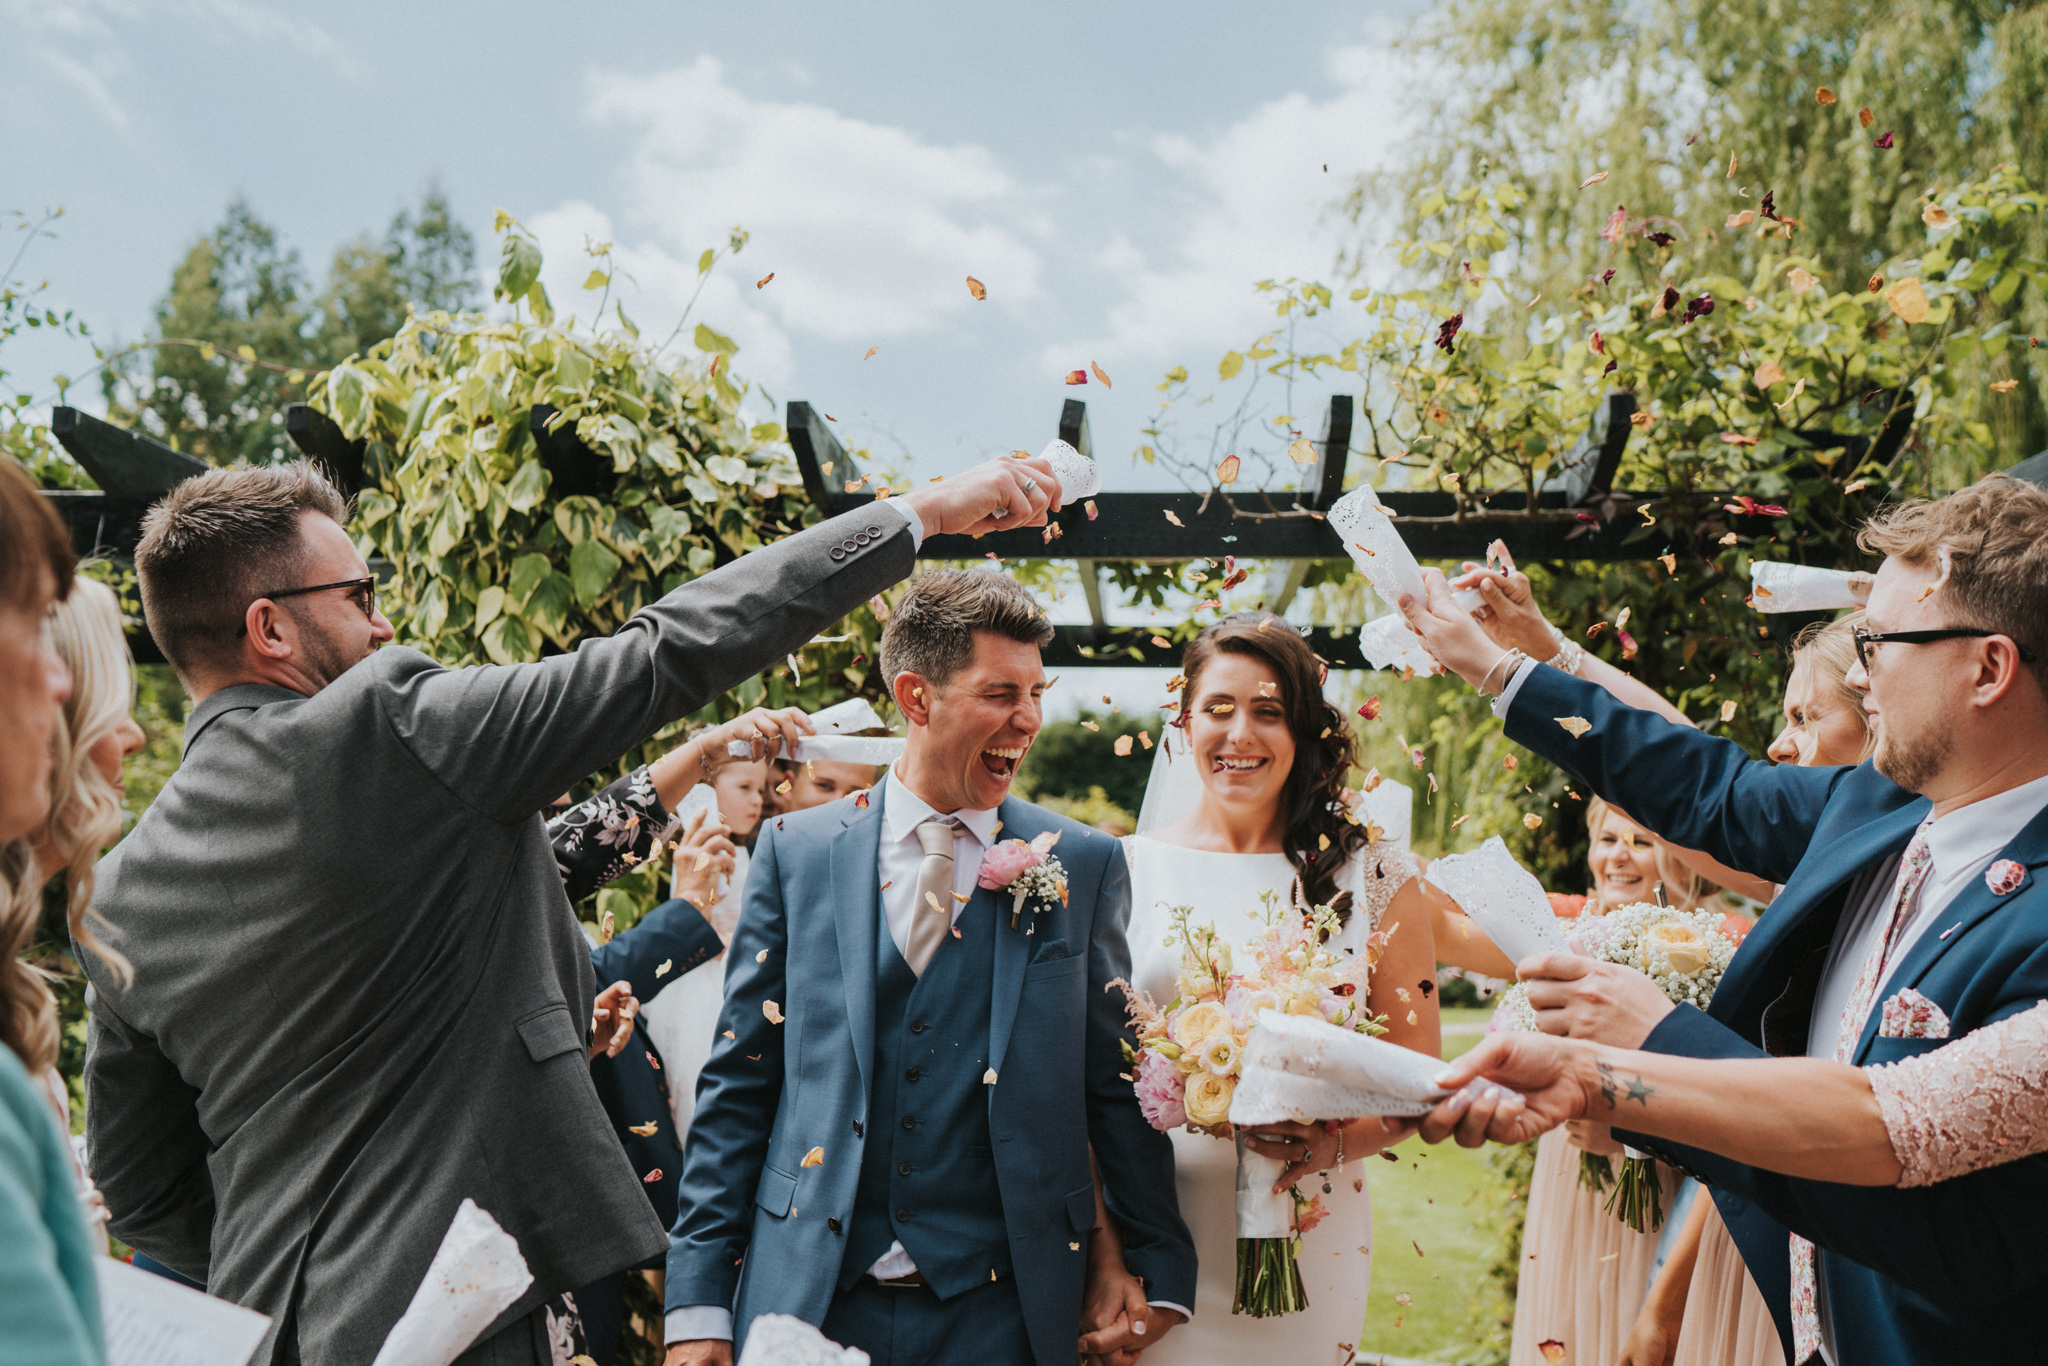 danielle-and-gareths-boho-wedding-previews-at-high-house-weddings-grace-elizabeth-colchester-essex-suffolk-norfolk-devon-alternative-wedding-and-lifestyle-photographer (32 of 76).jpg